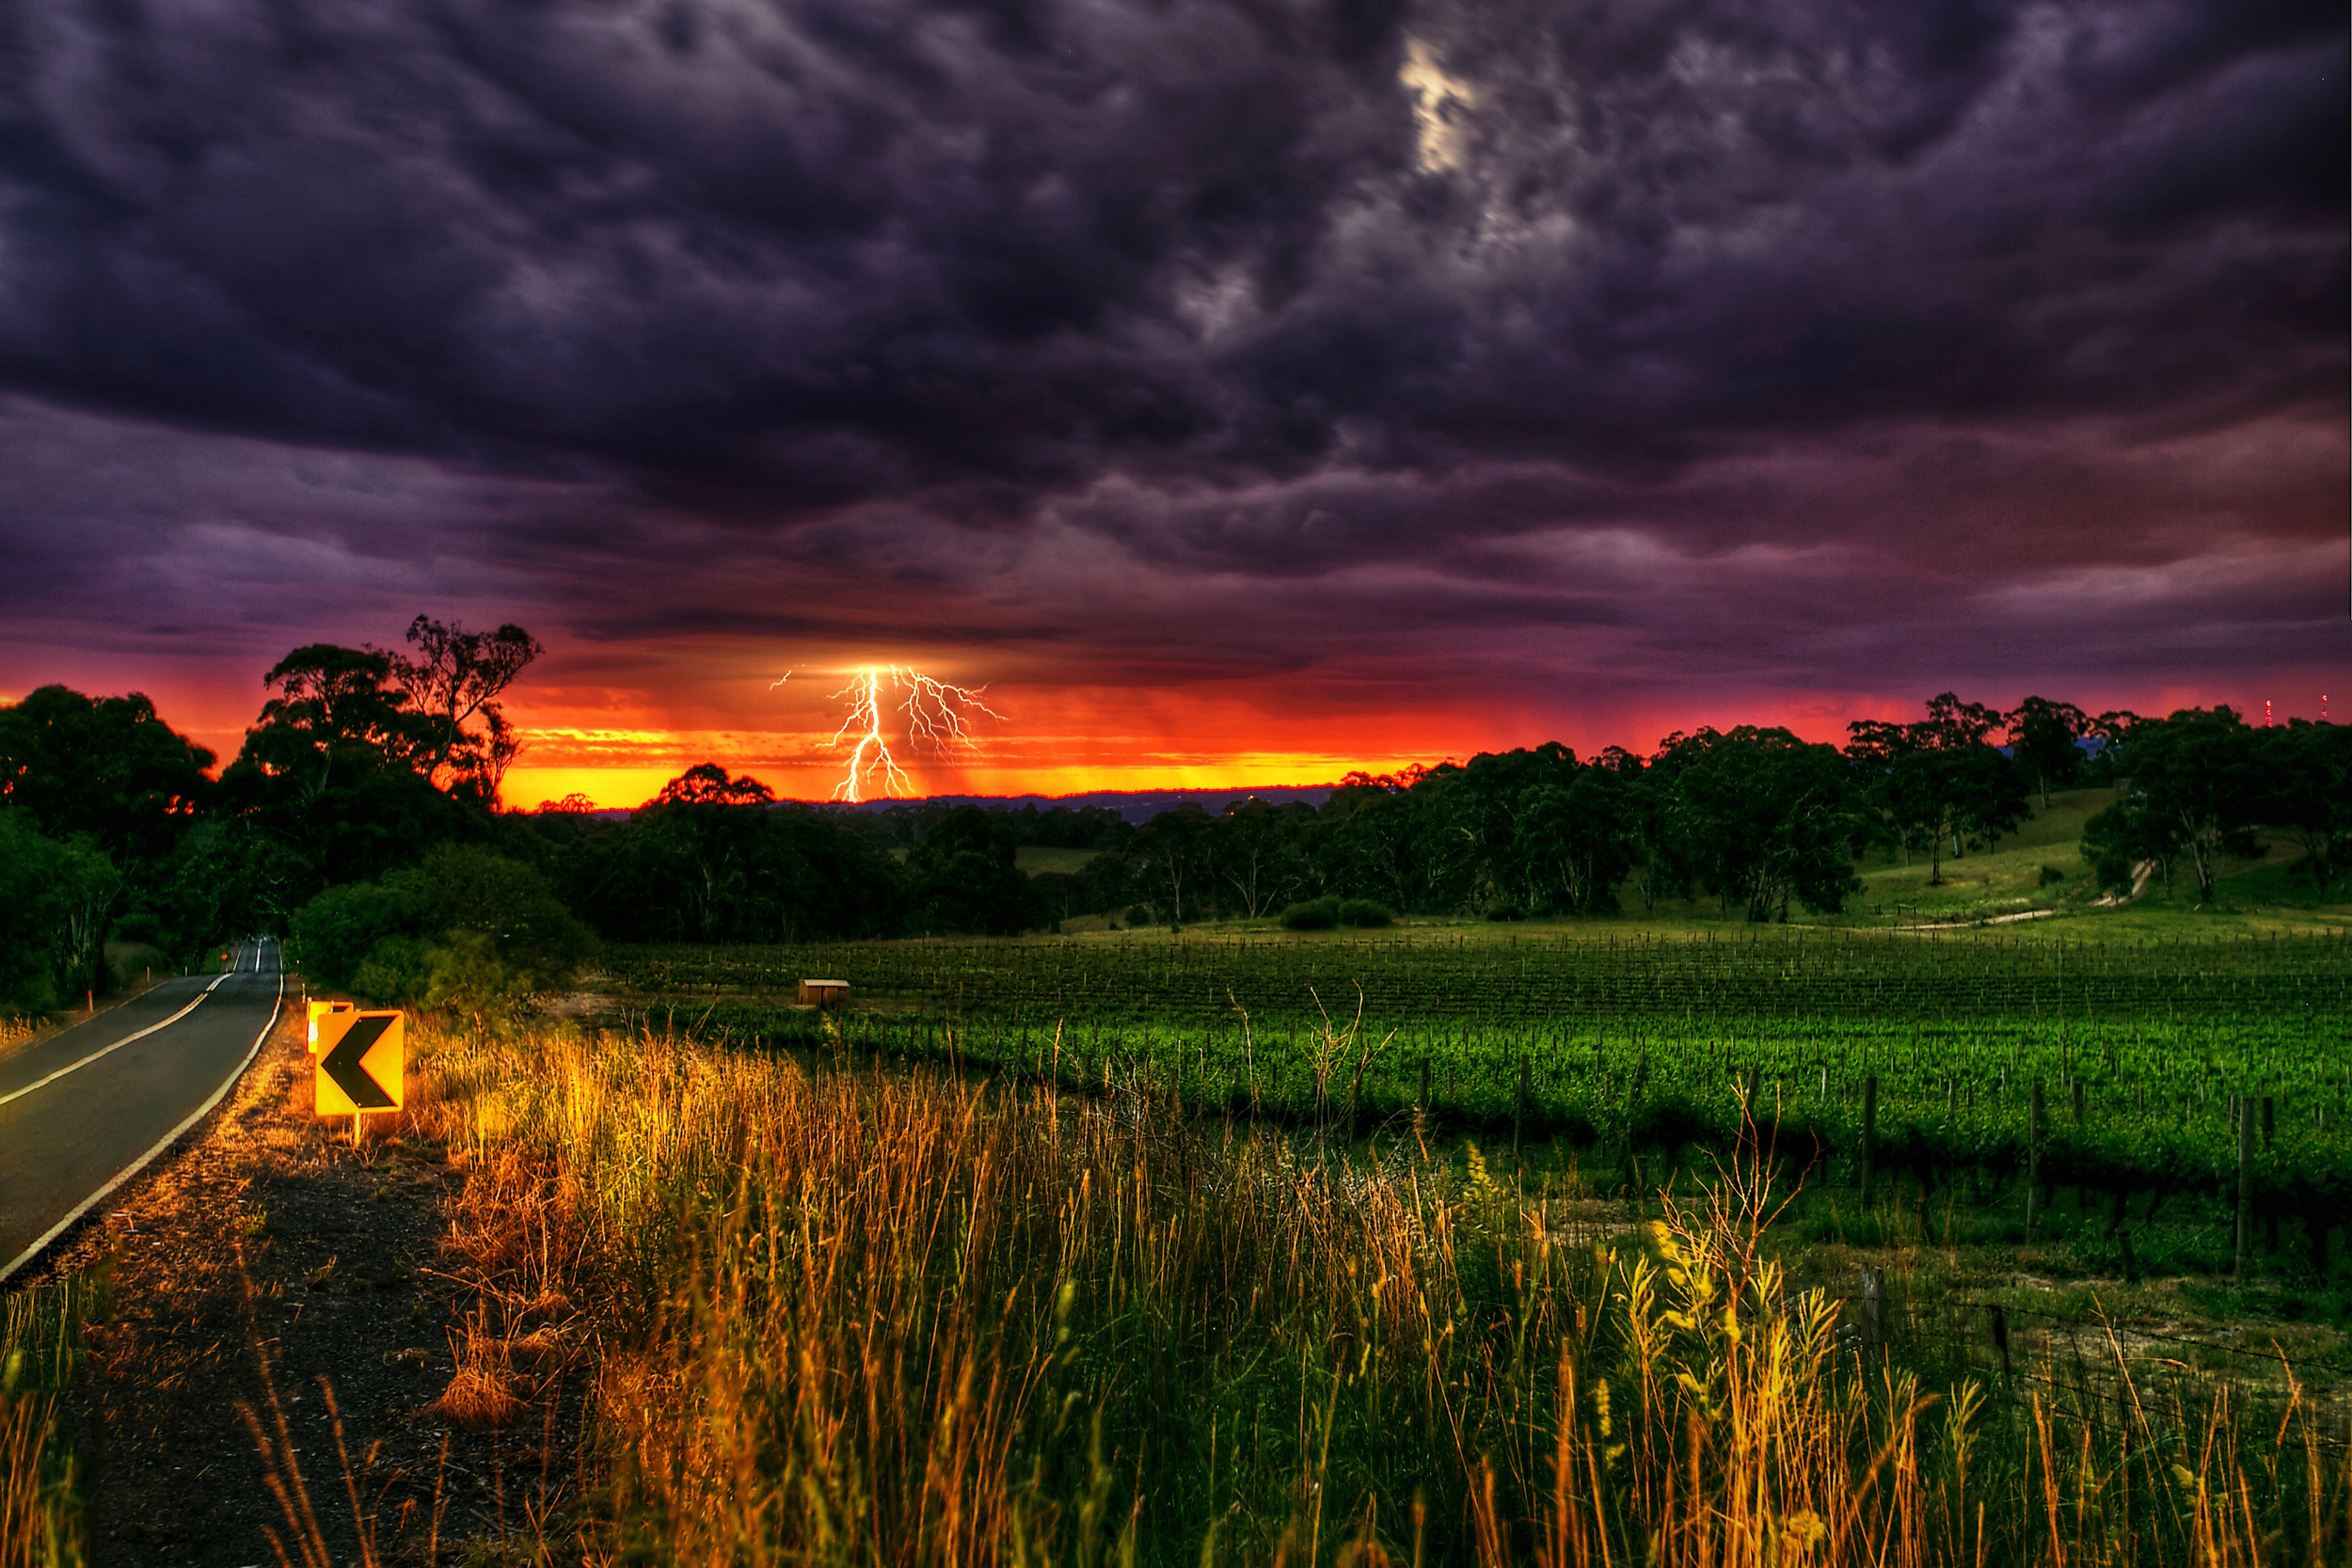 hdr lightning edit.jpg